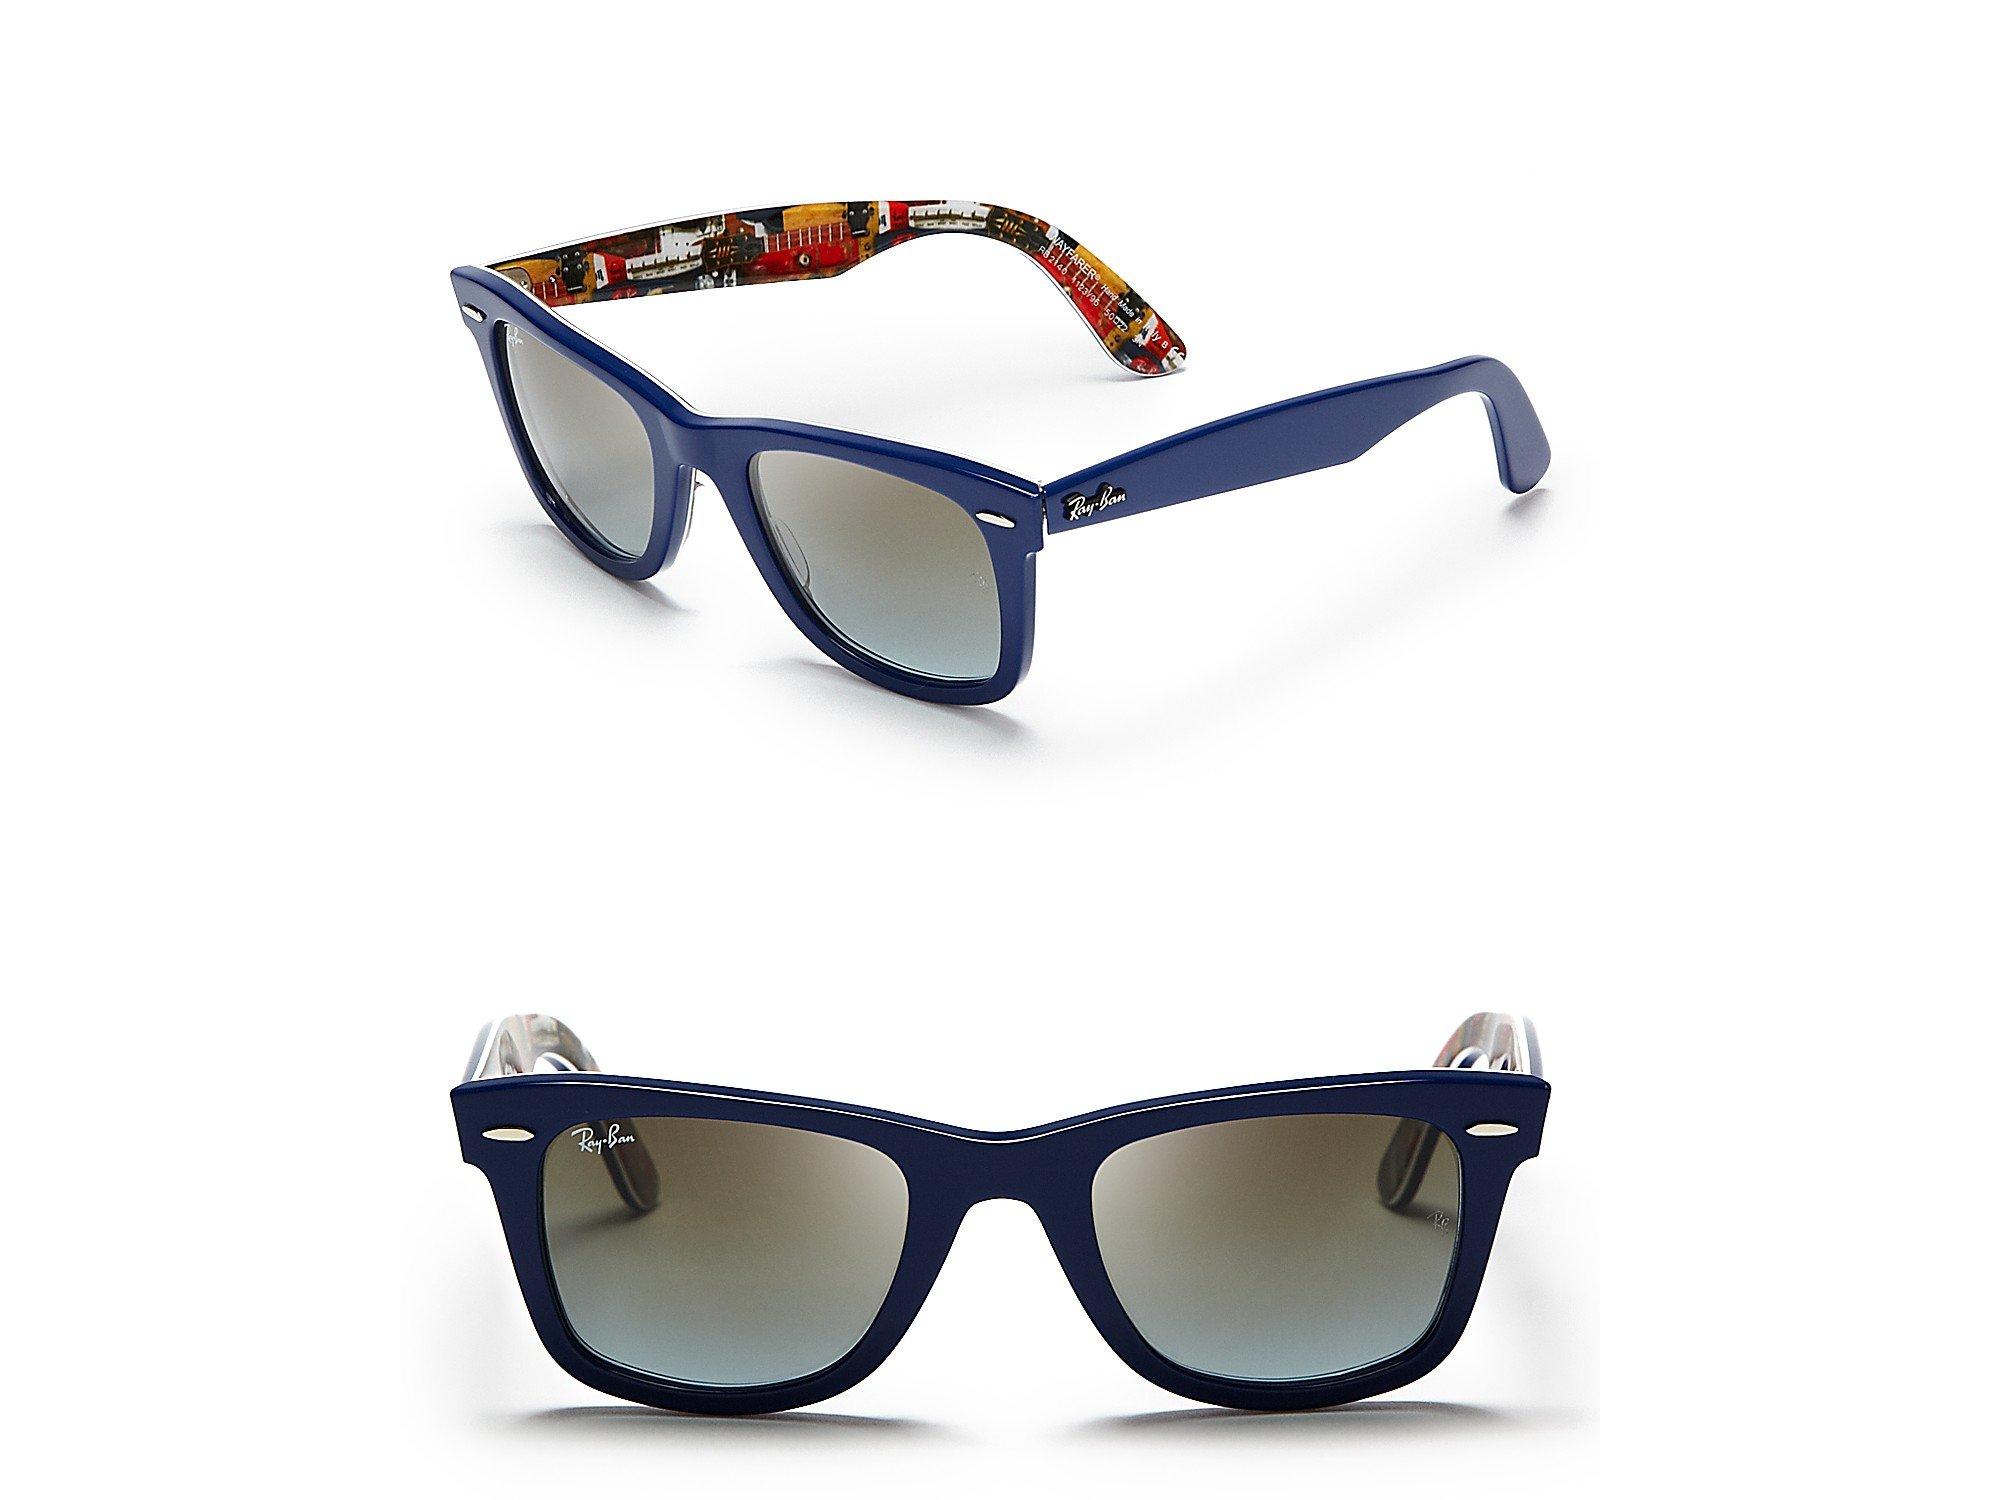 glasses similar to ray ban clubmaster  like ray ban wayfarer